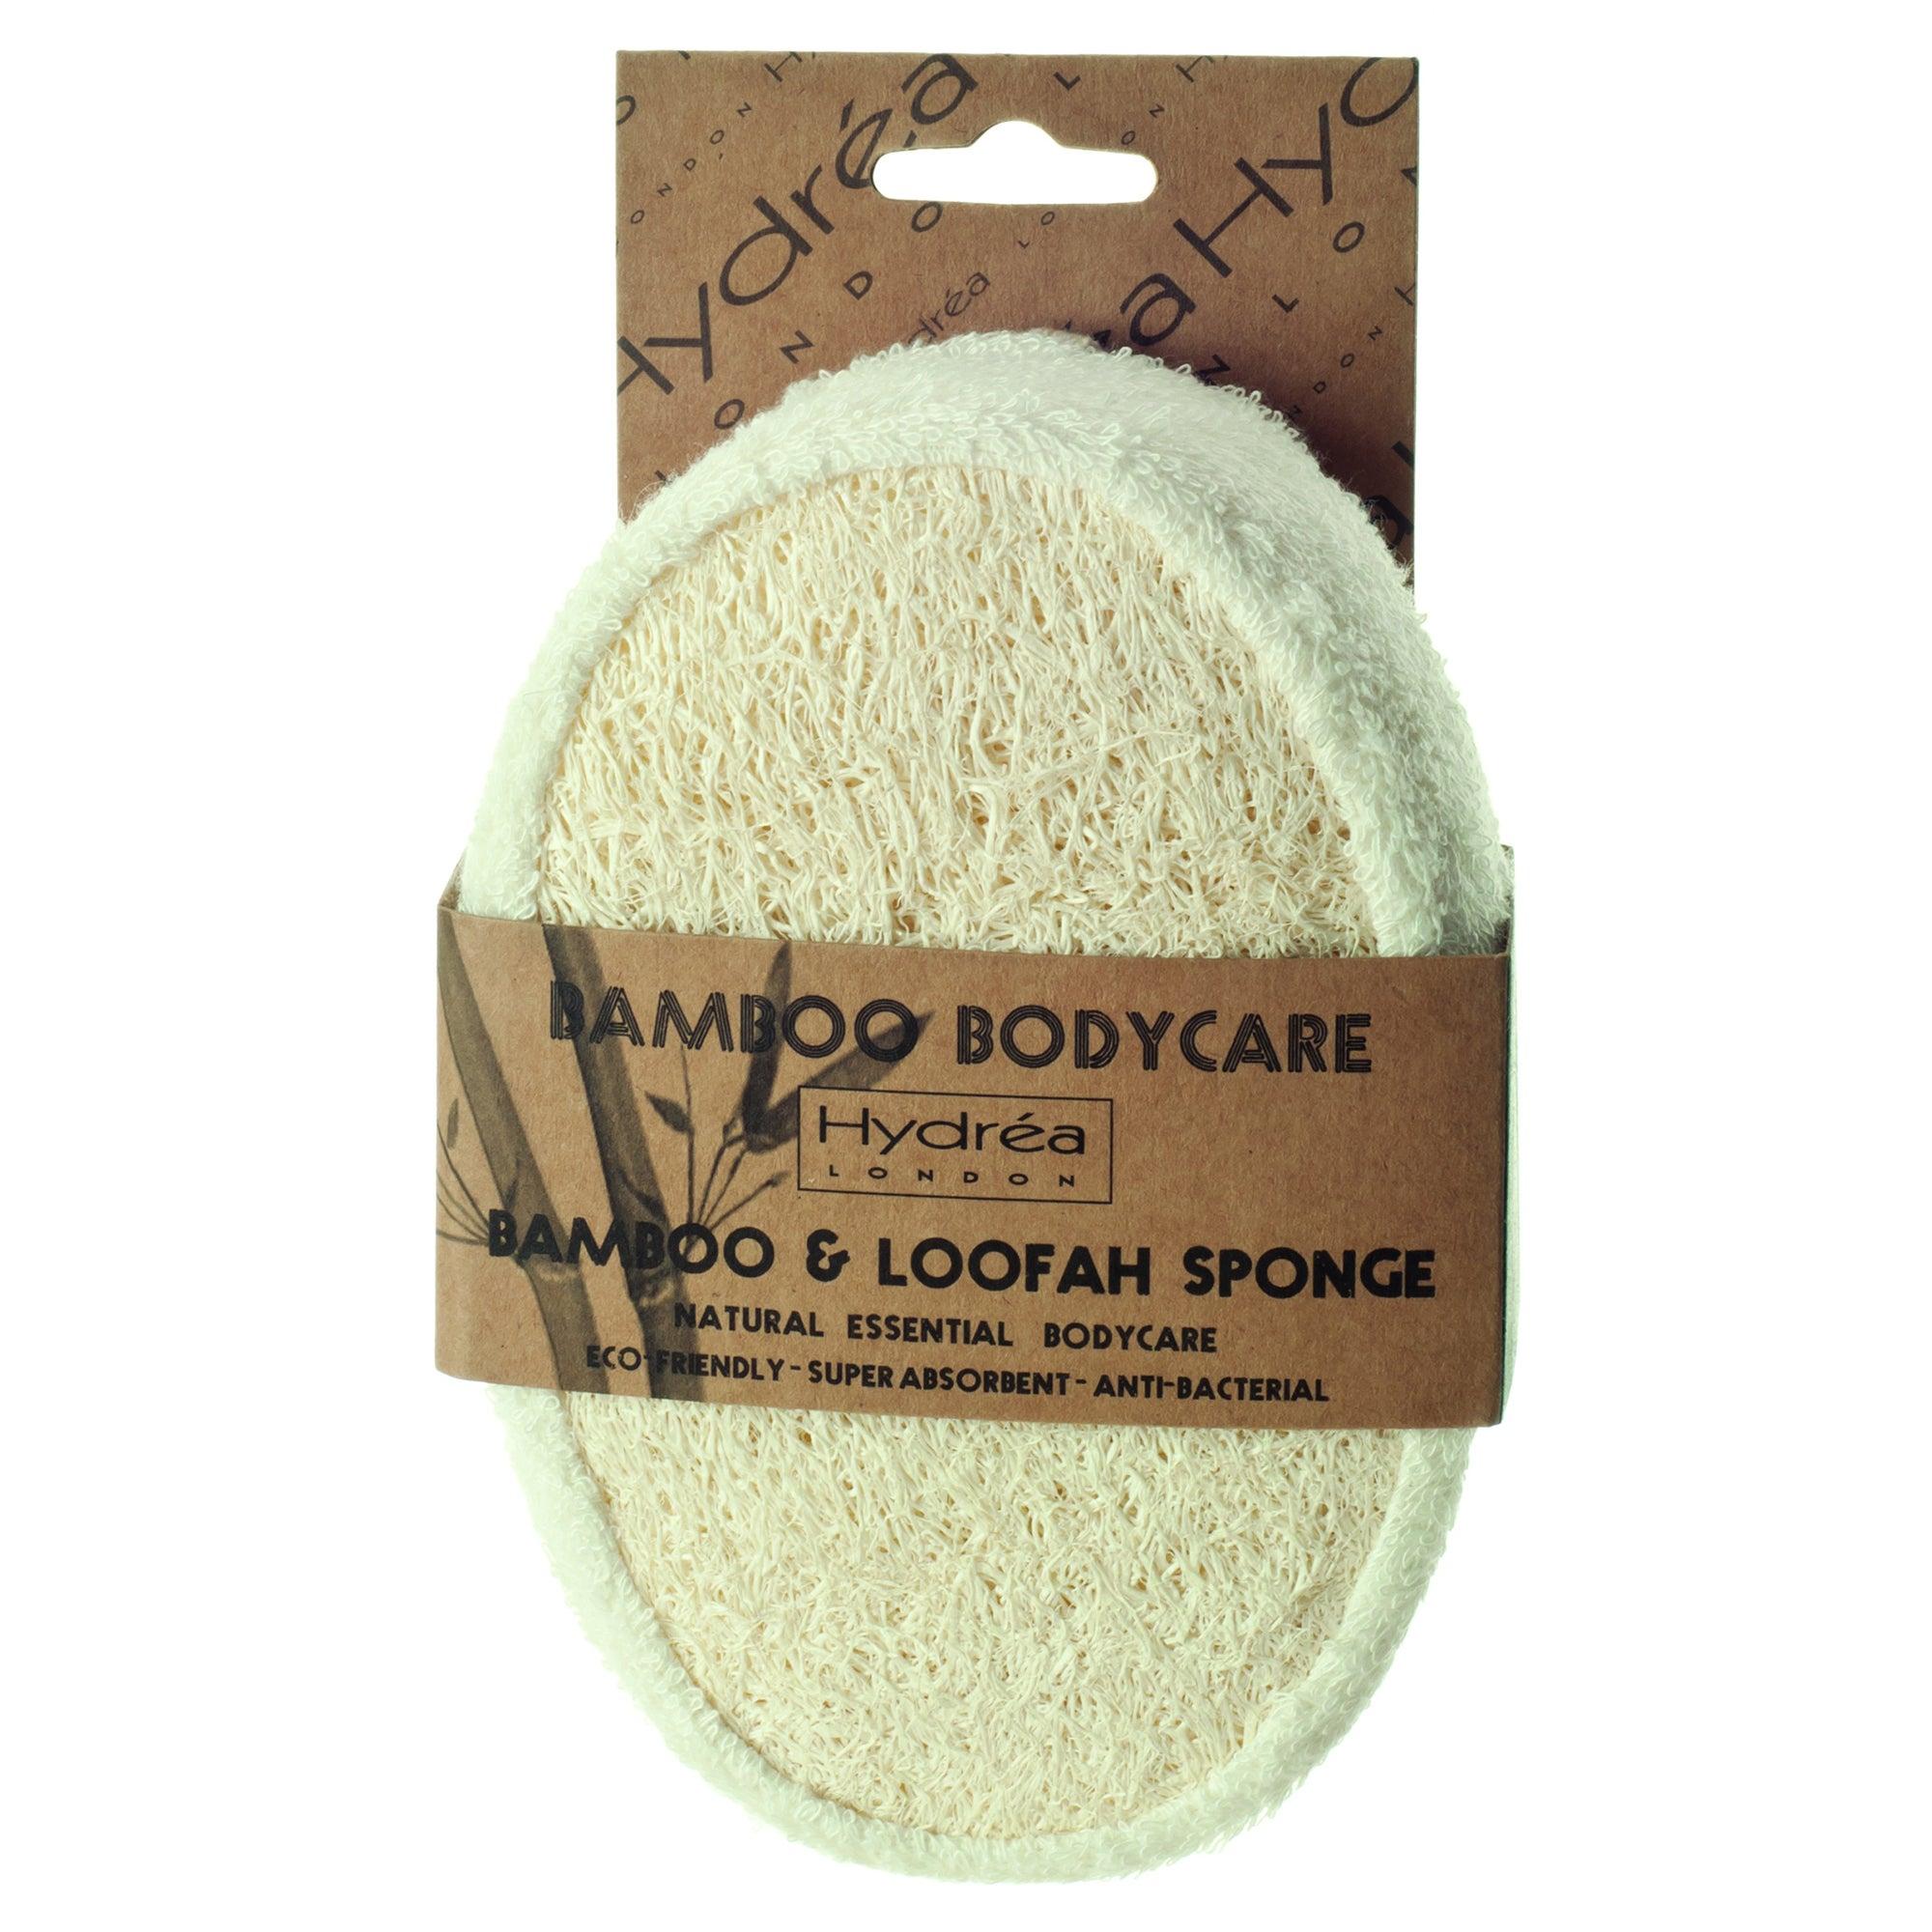 Hydrea Bamboo and Loofah Sponge